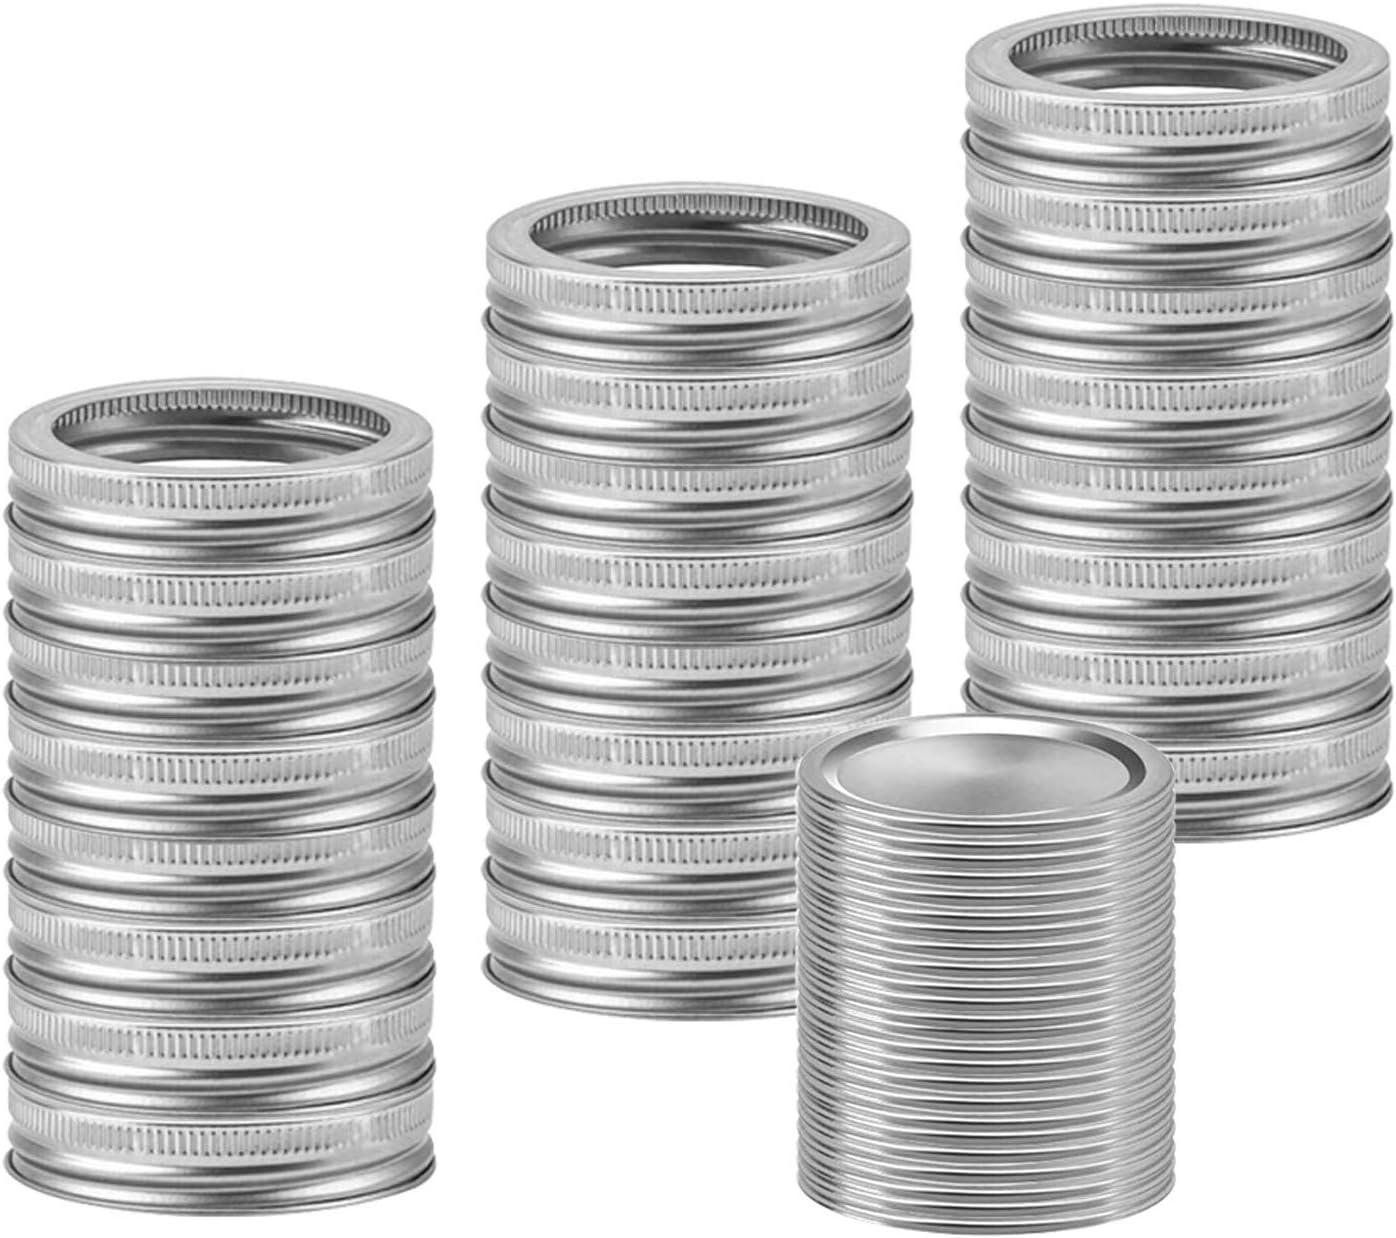 trohe Mason Jar Canning Lids Regular Mouth Lids Split-Type Reusable Lids Leak Proof Secure Mason Storage Caps, 24 Sets per Box (70mm,Silver)